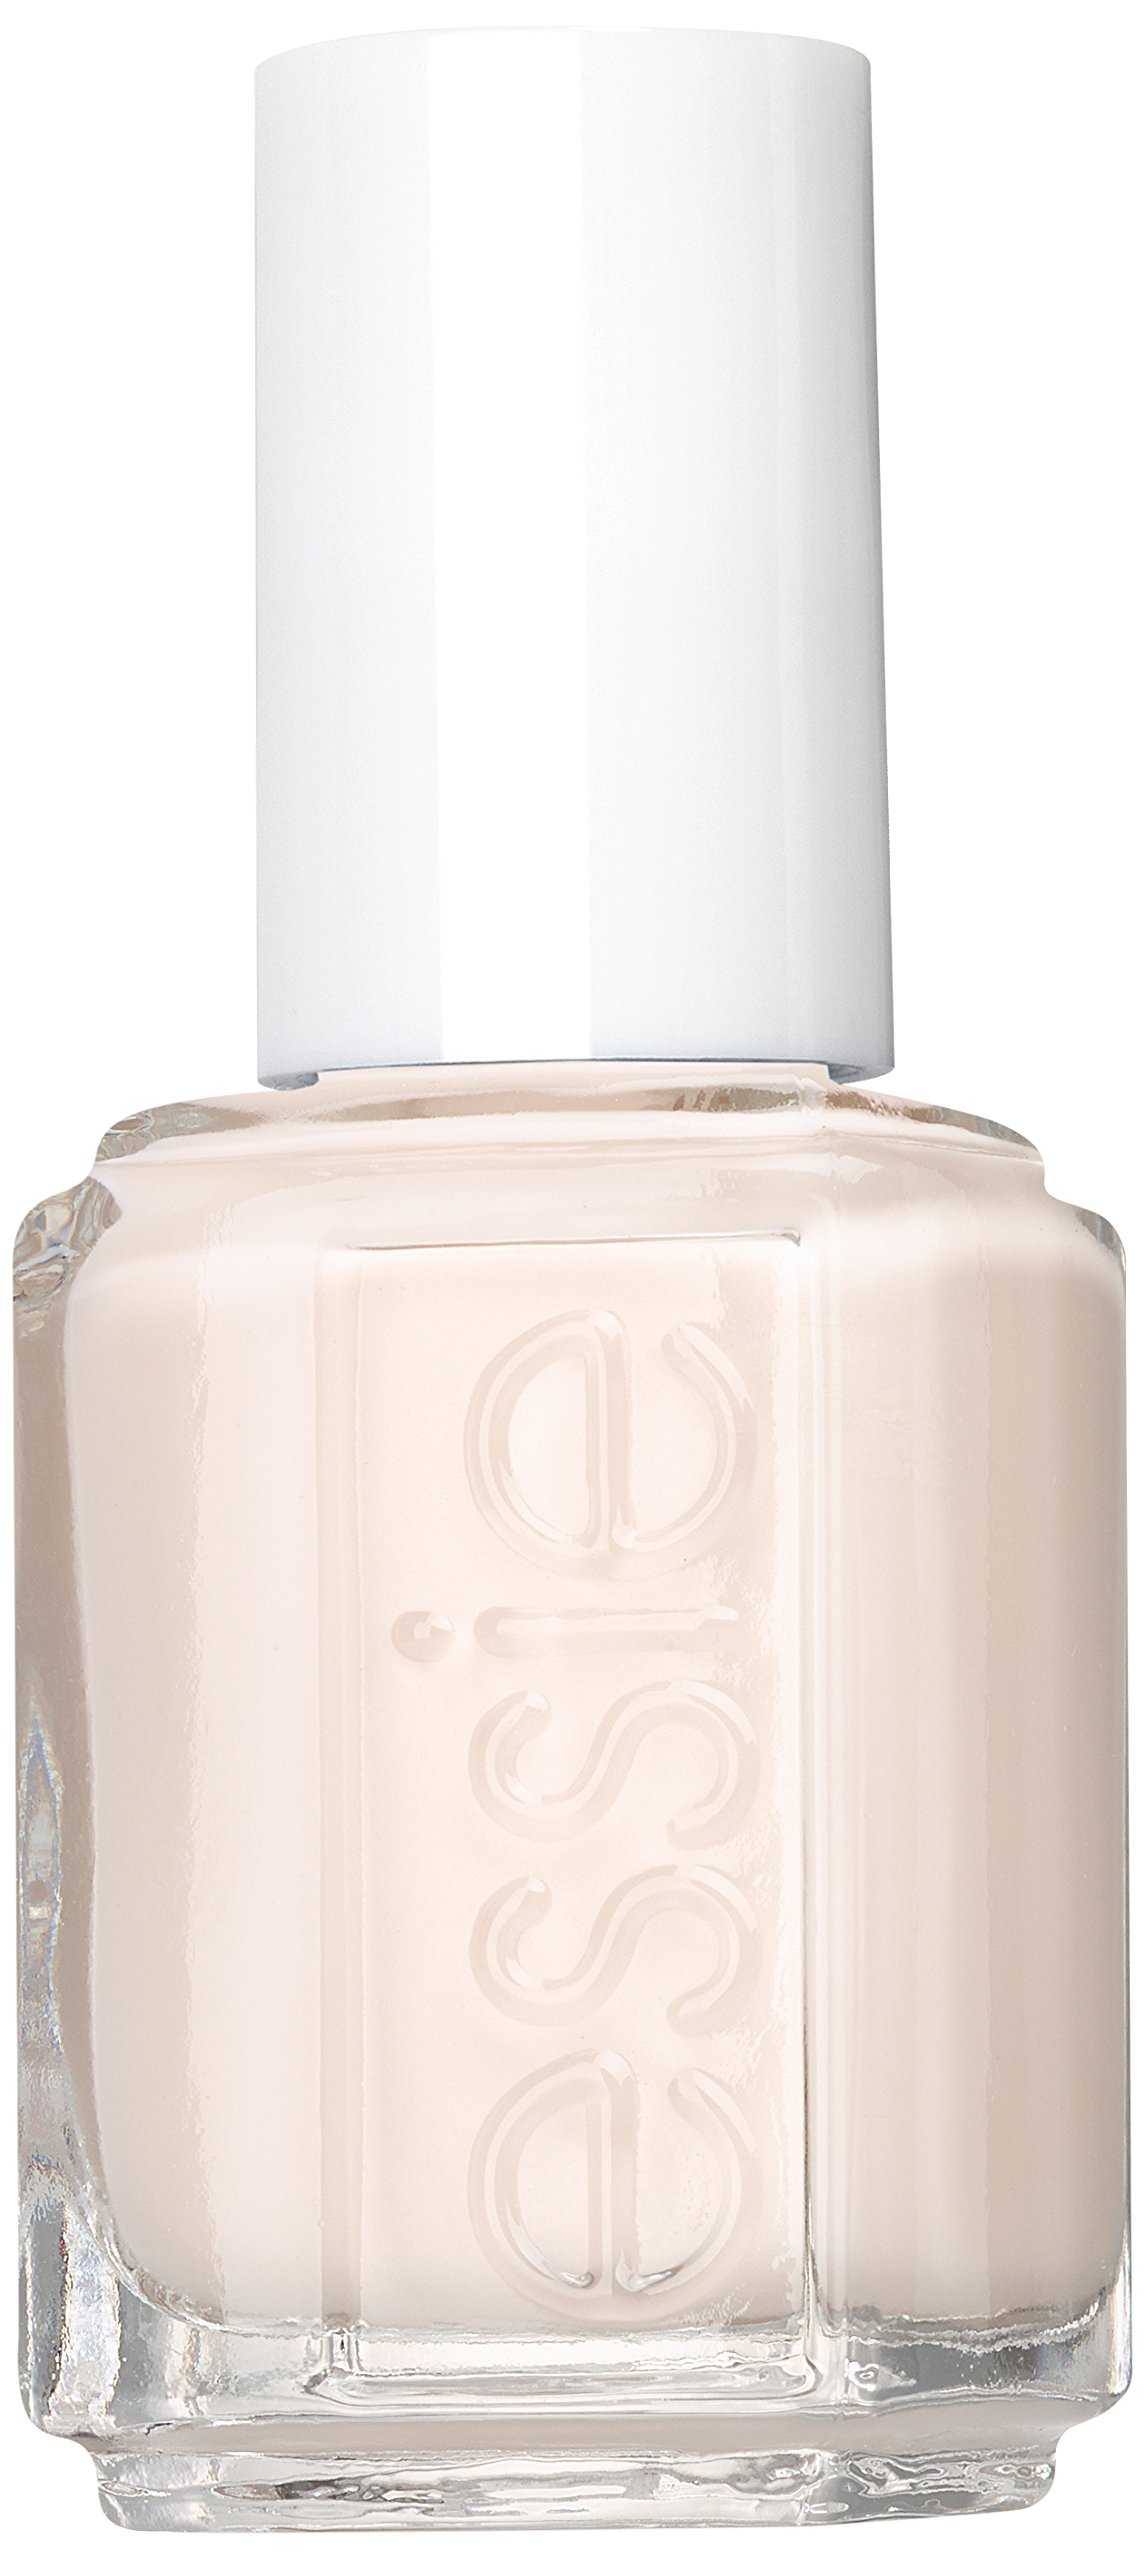 essie 352 Wrap Me Up - nail polishes (Beige Wrap Me Up ETHYL ACETATE ...